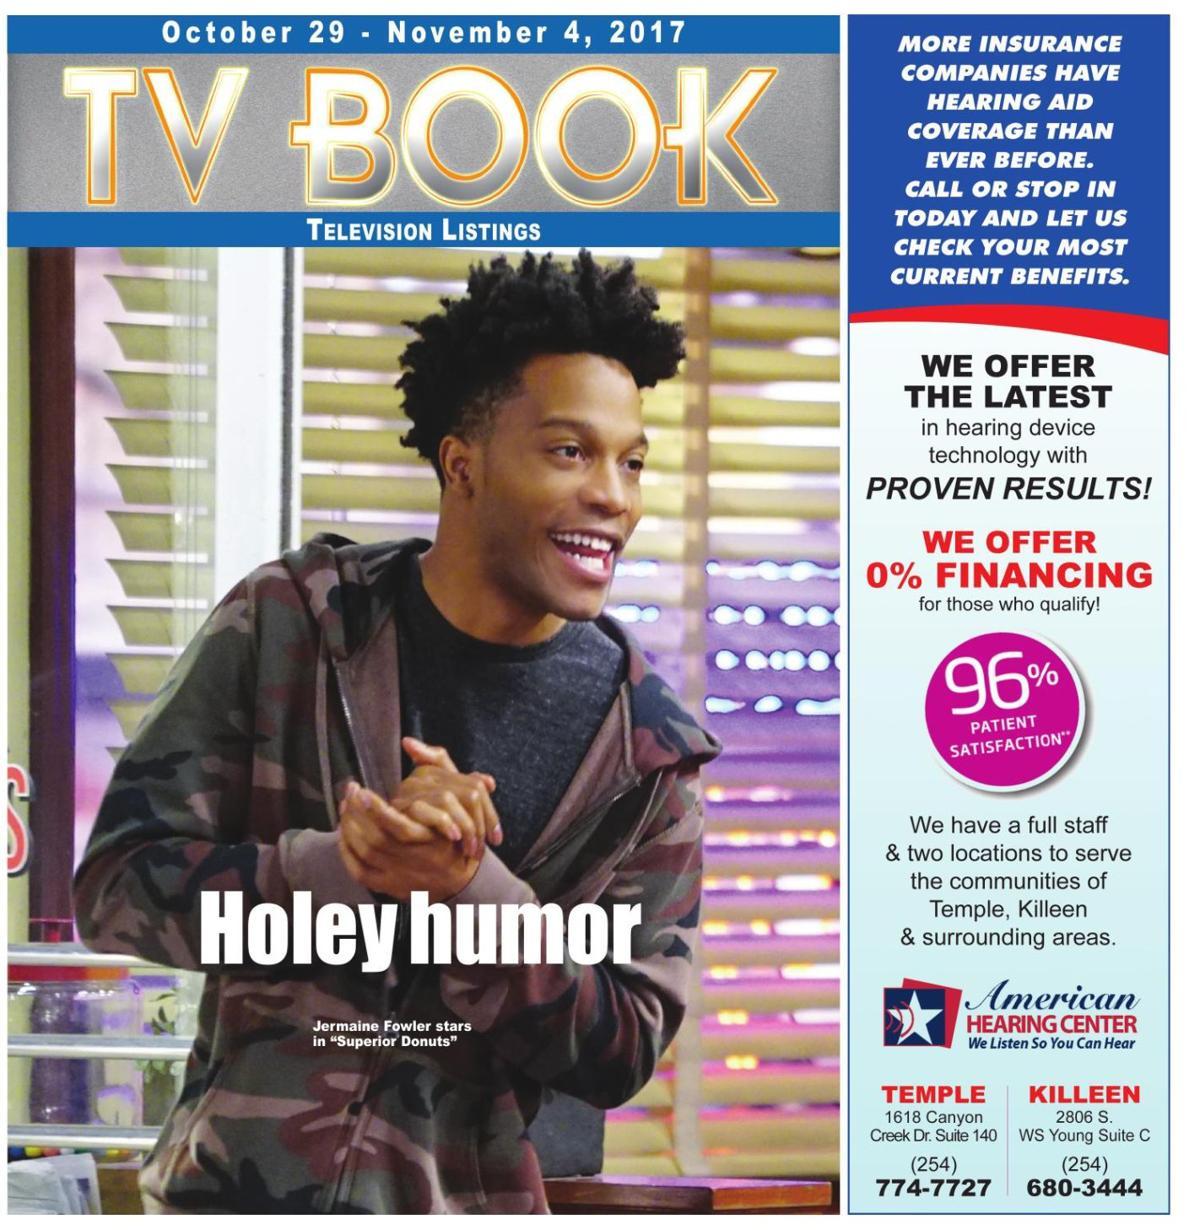 TV Book October 29th - November 4th